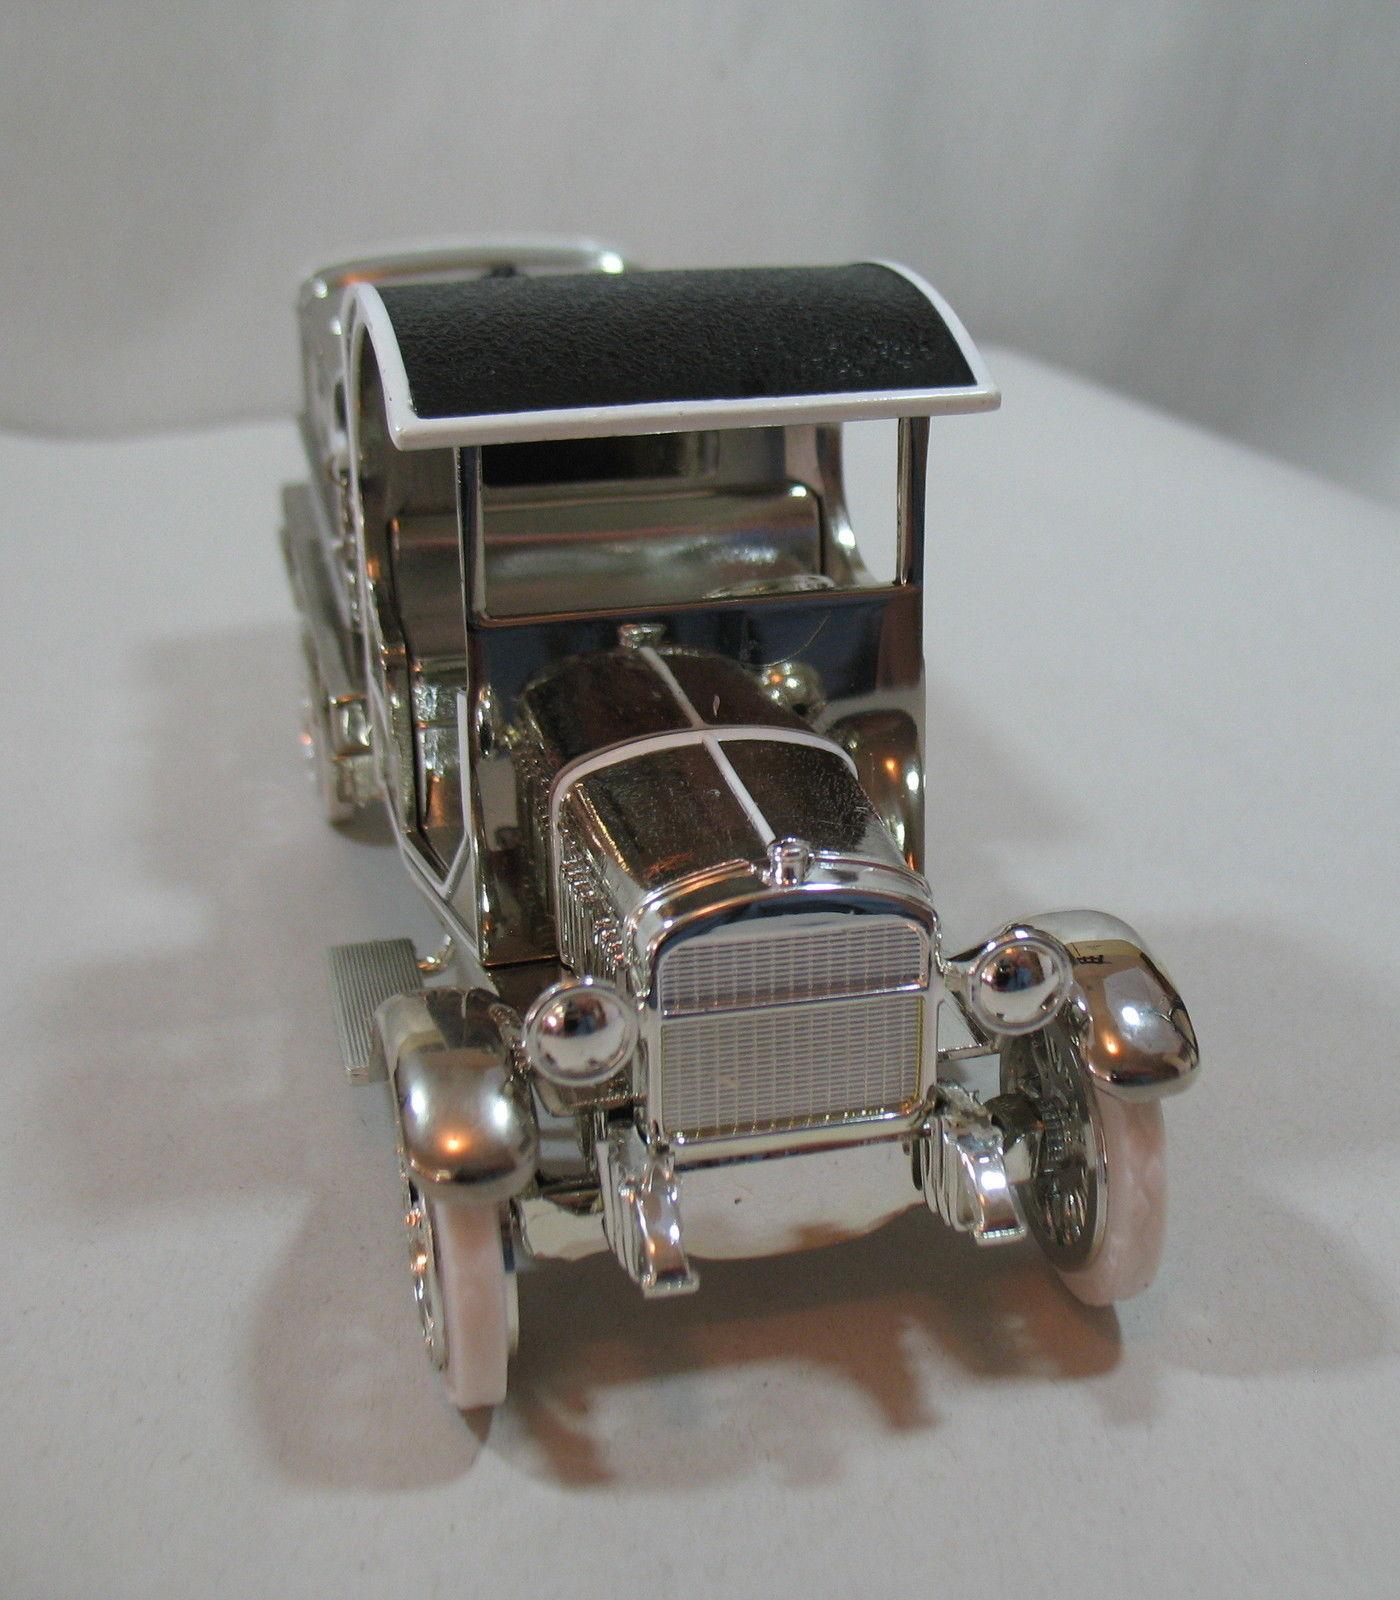 Ertl 1919 Texaco GMC Tanker Truck Special Chrome Millennium Edition Die Cast image 3